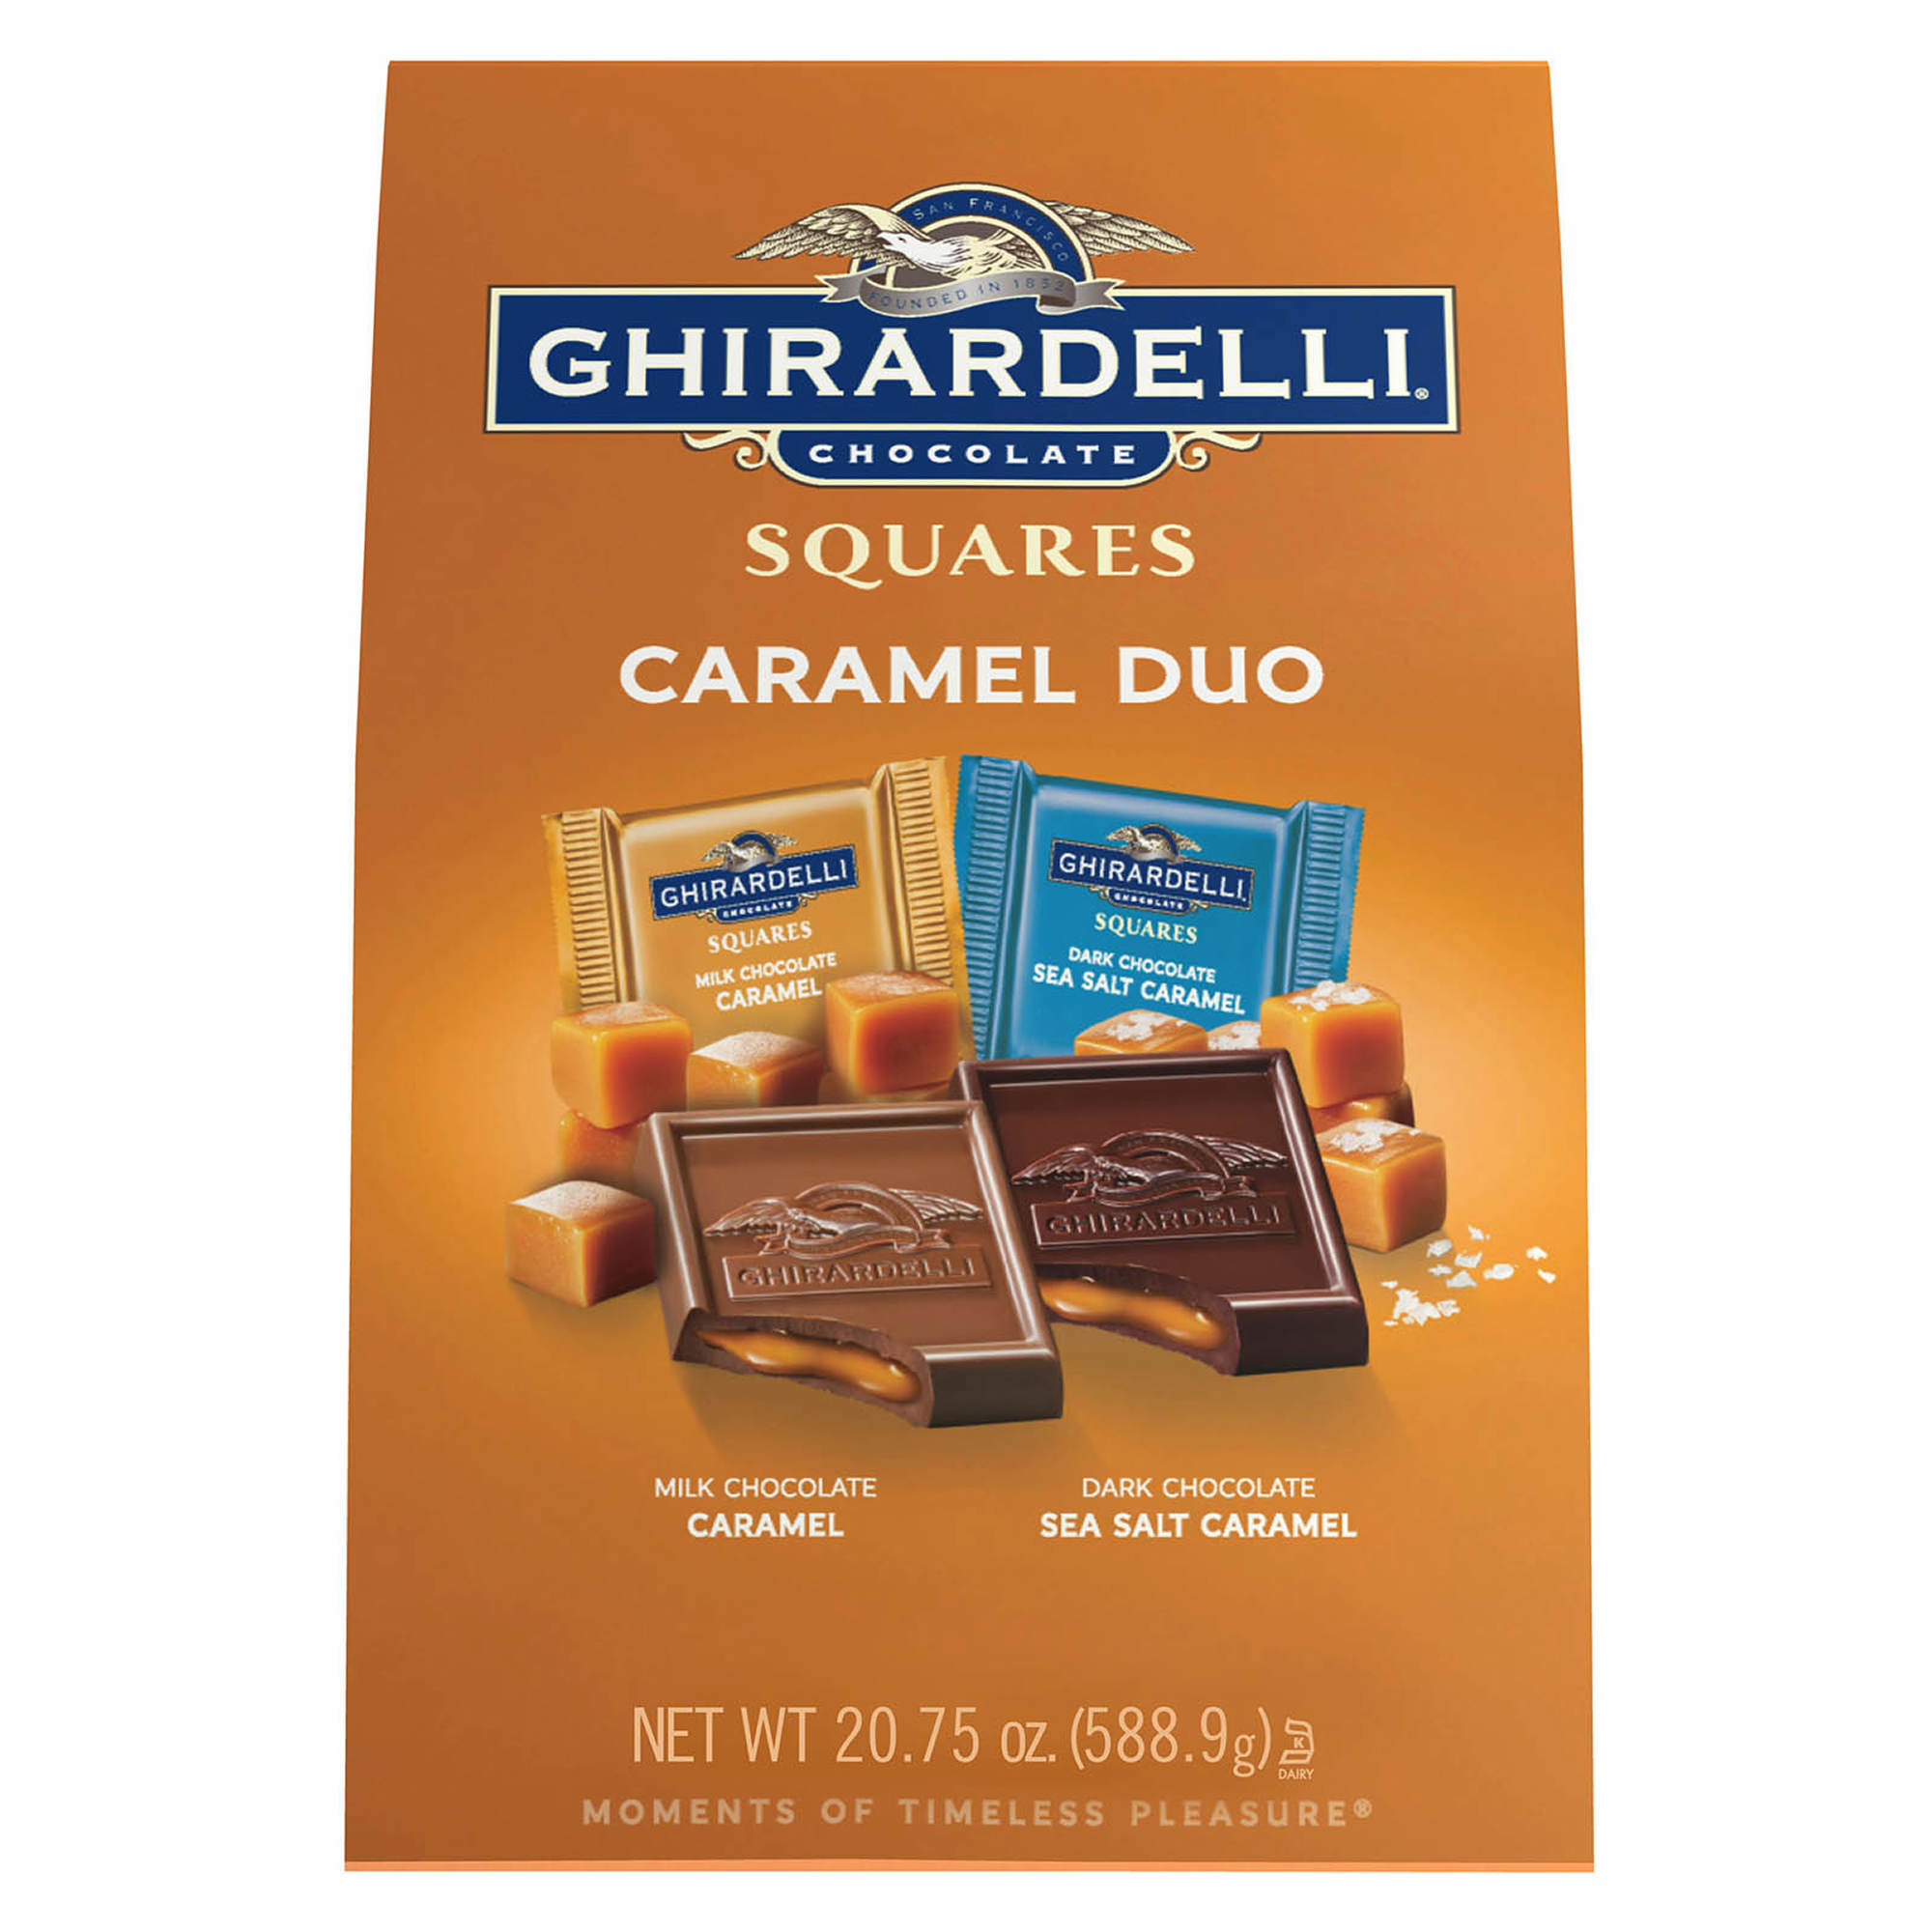 Ghirardelli Milk & Caramel Chocolate Squares, 27.5 oz.